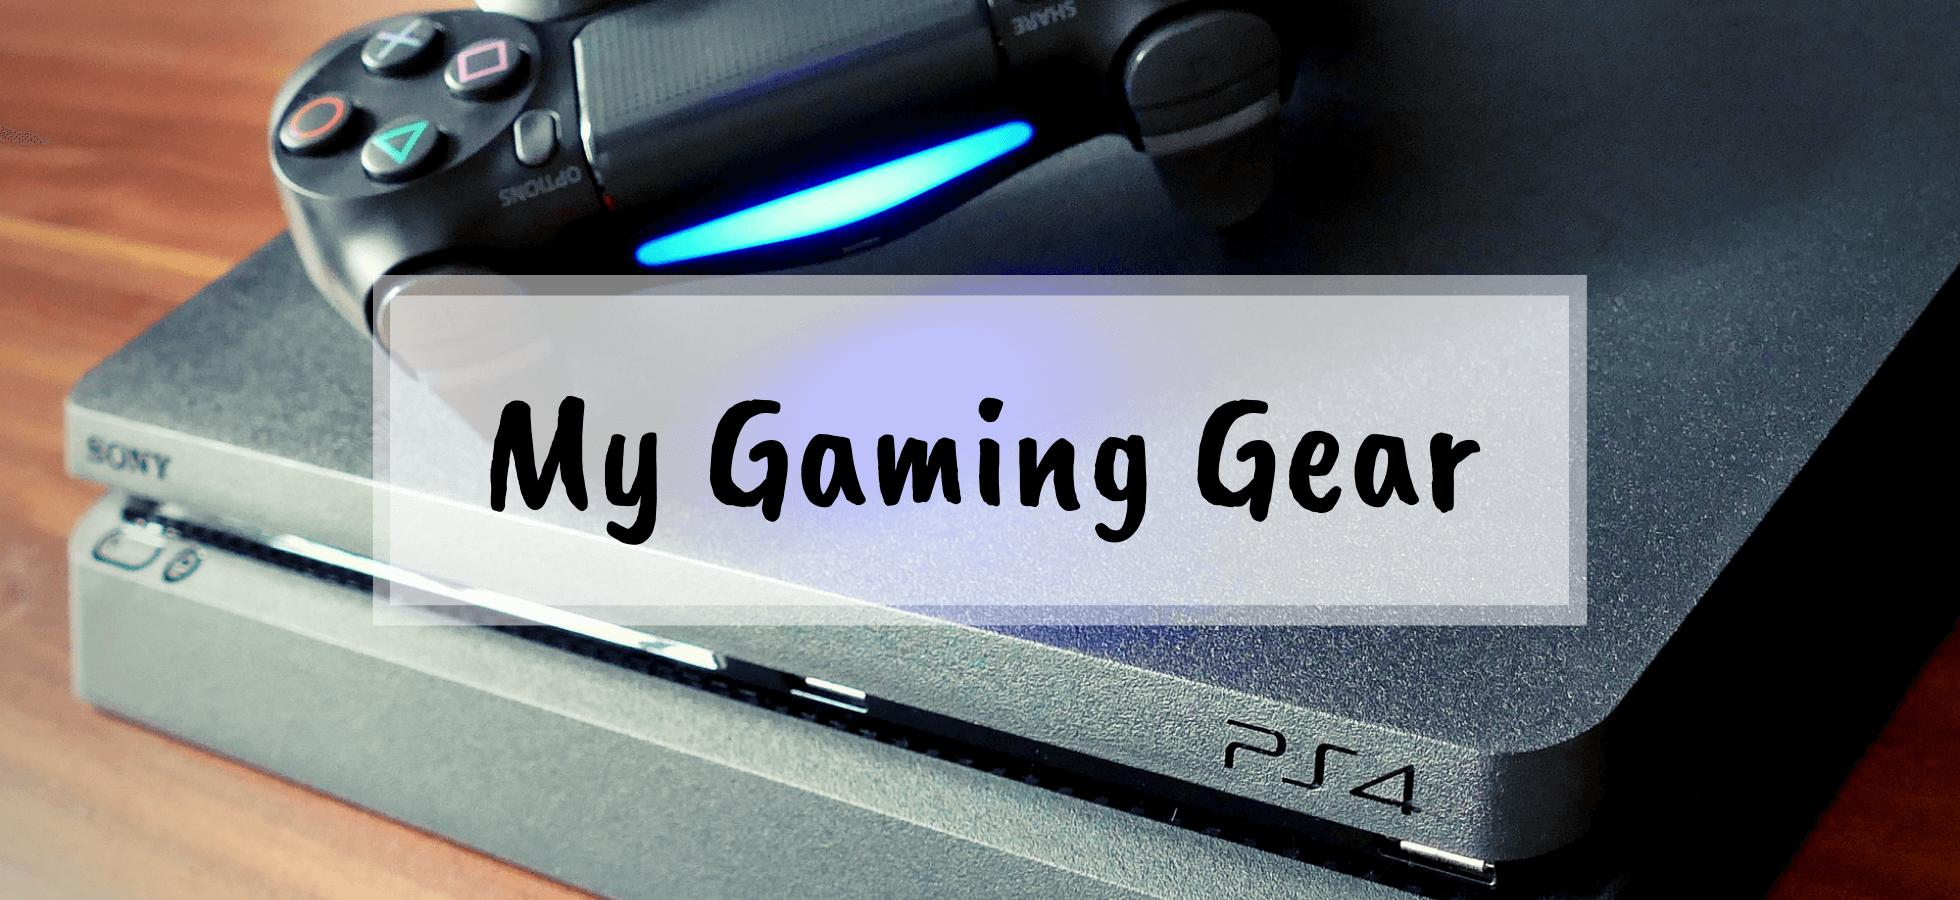 My Gaming Gear